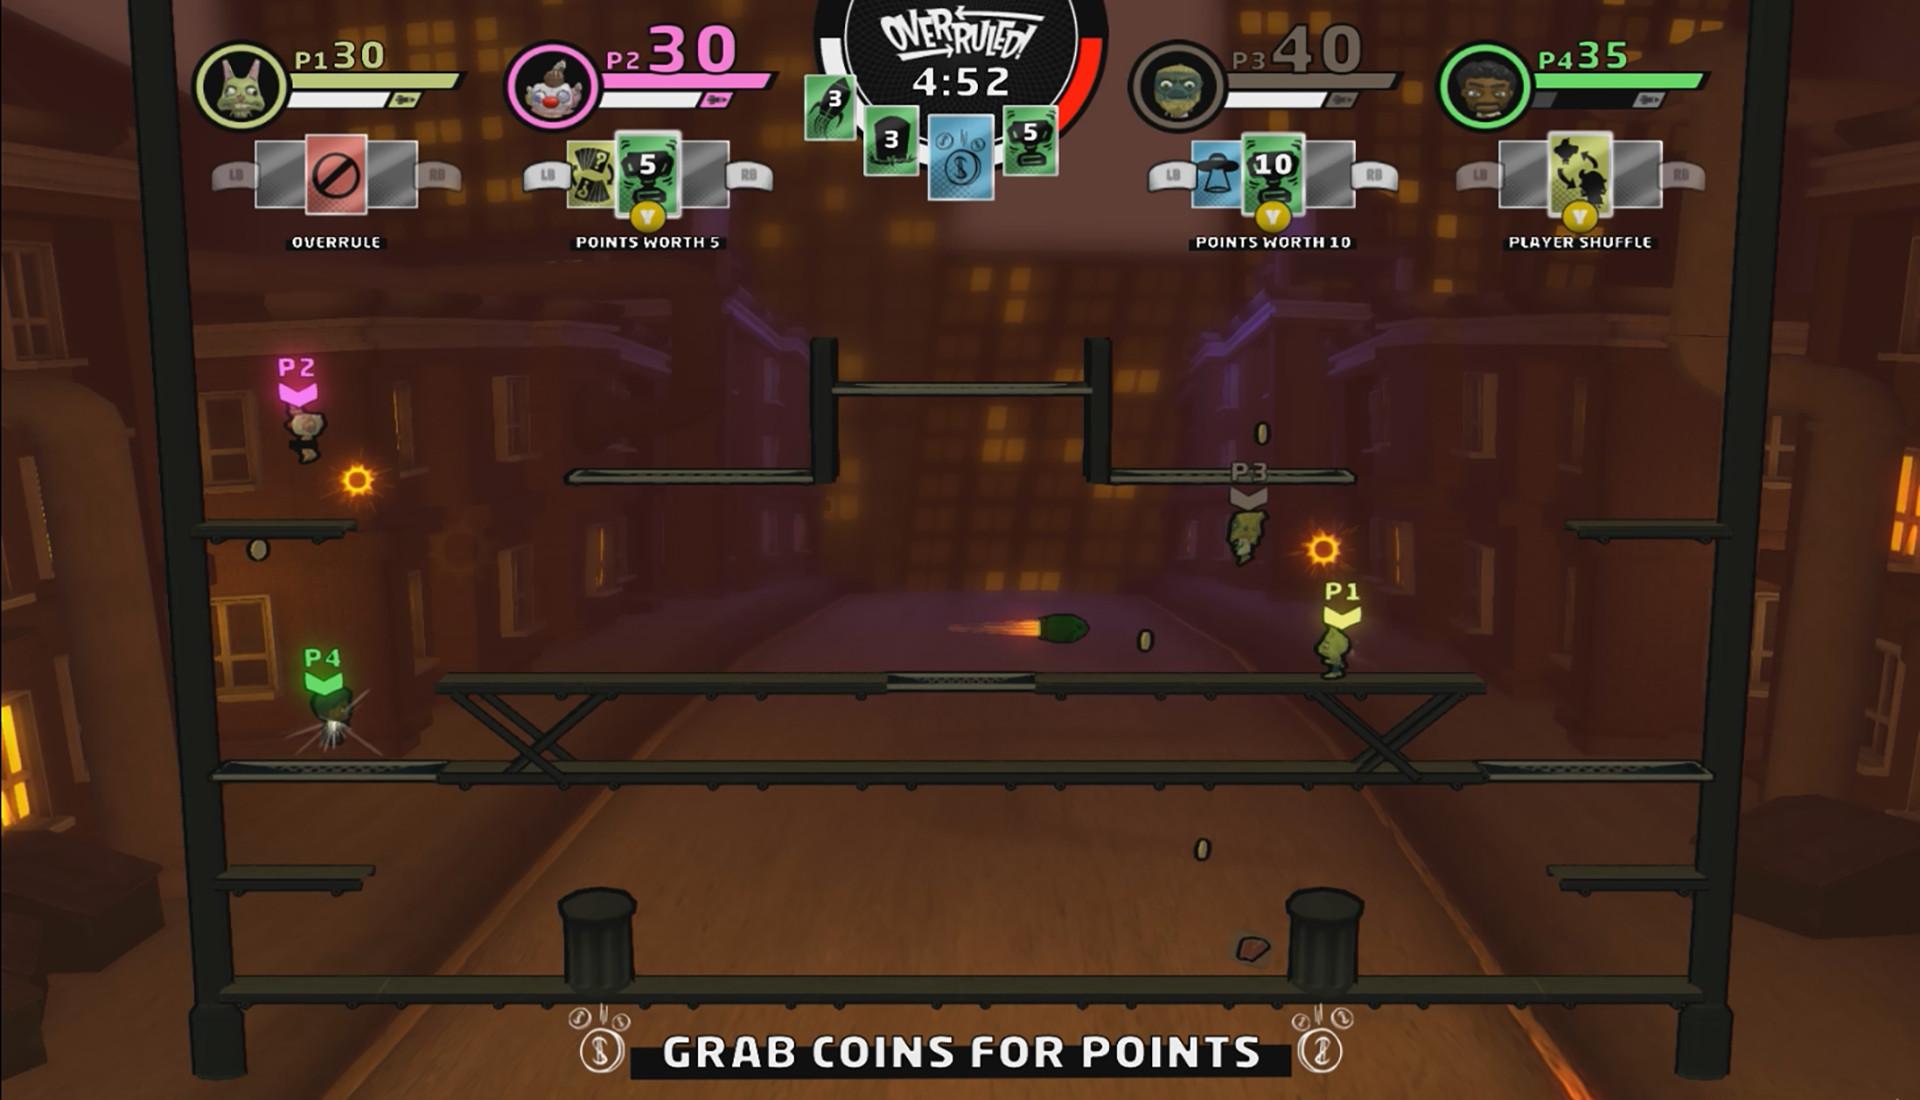 Overruled! game image